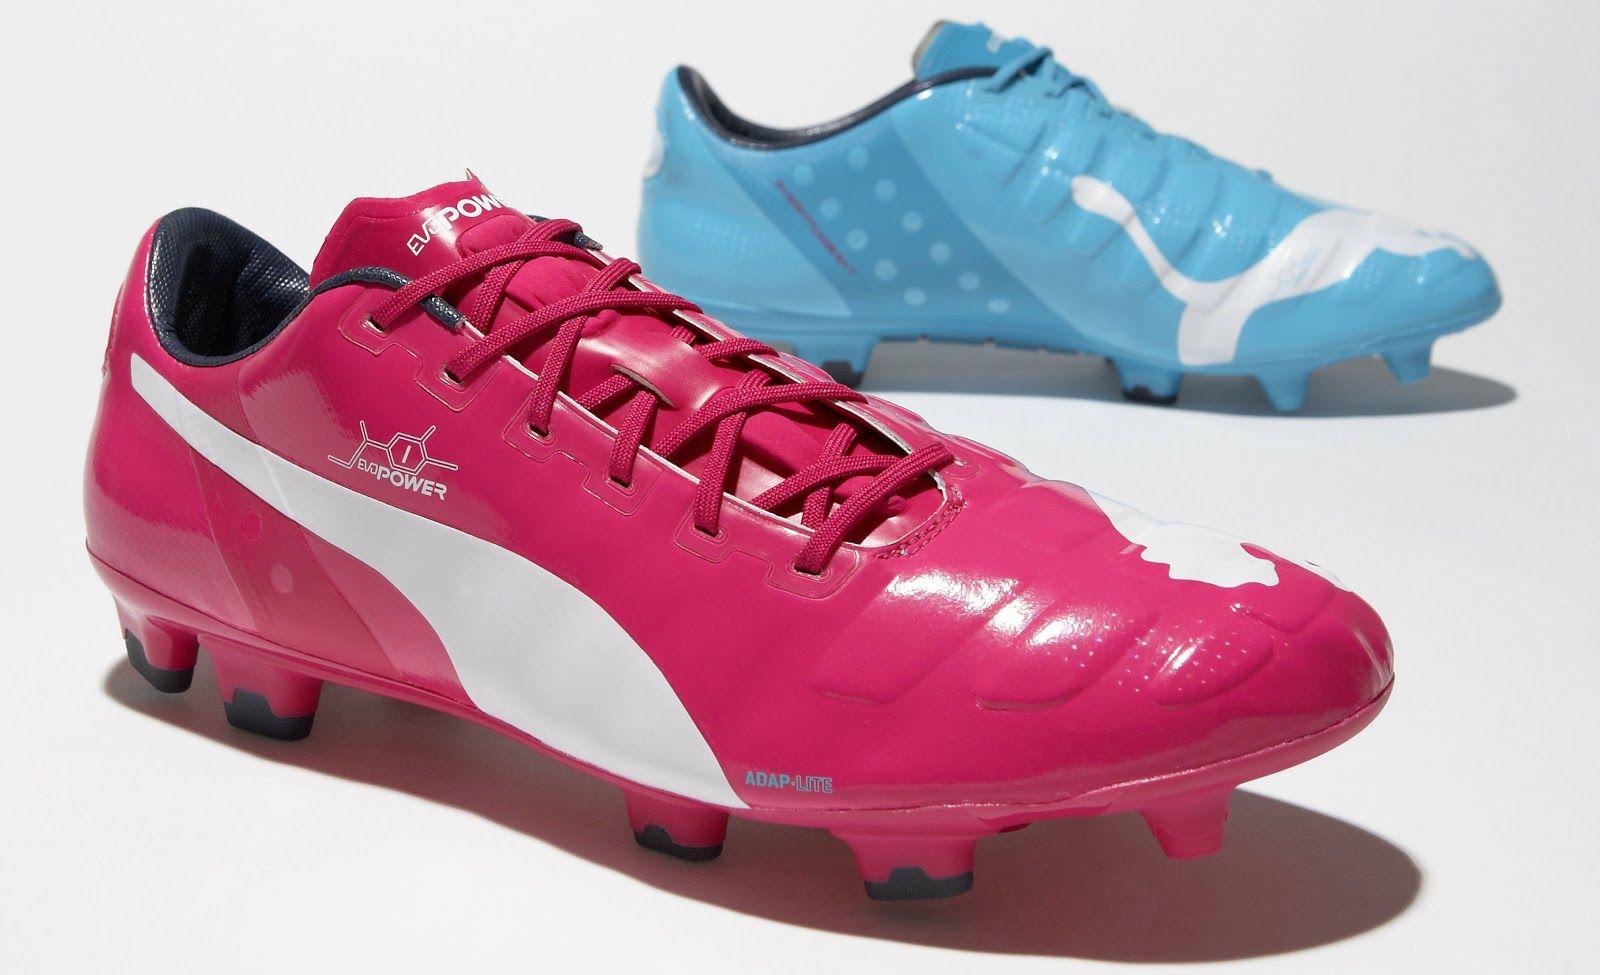 info pour a9b6e c278f Puma evoPOWER Tricks 2014 World Cup | Sport | Soccer cleats ...